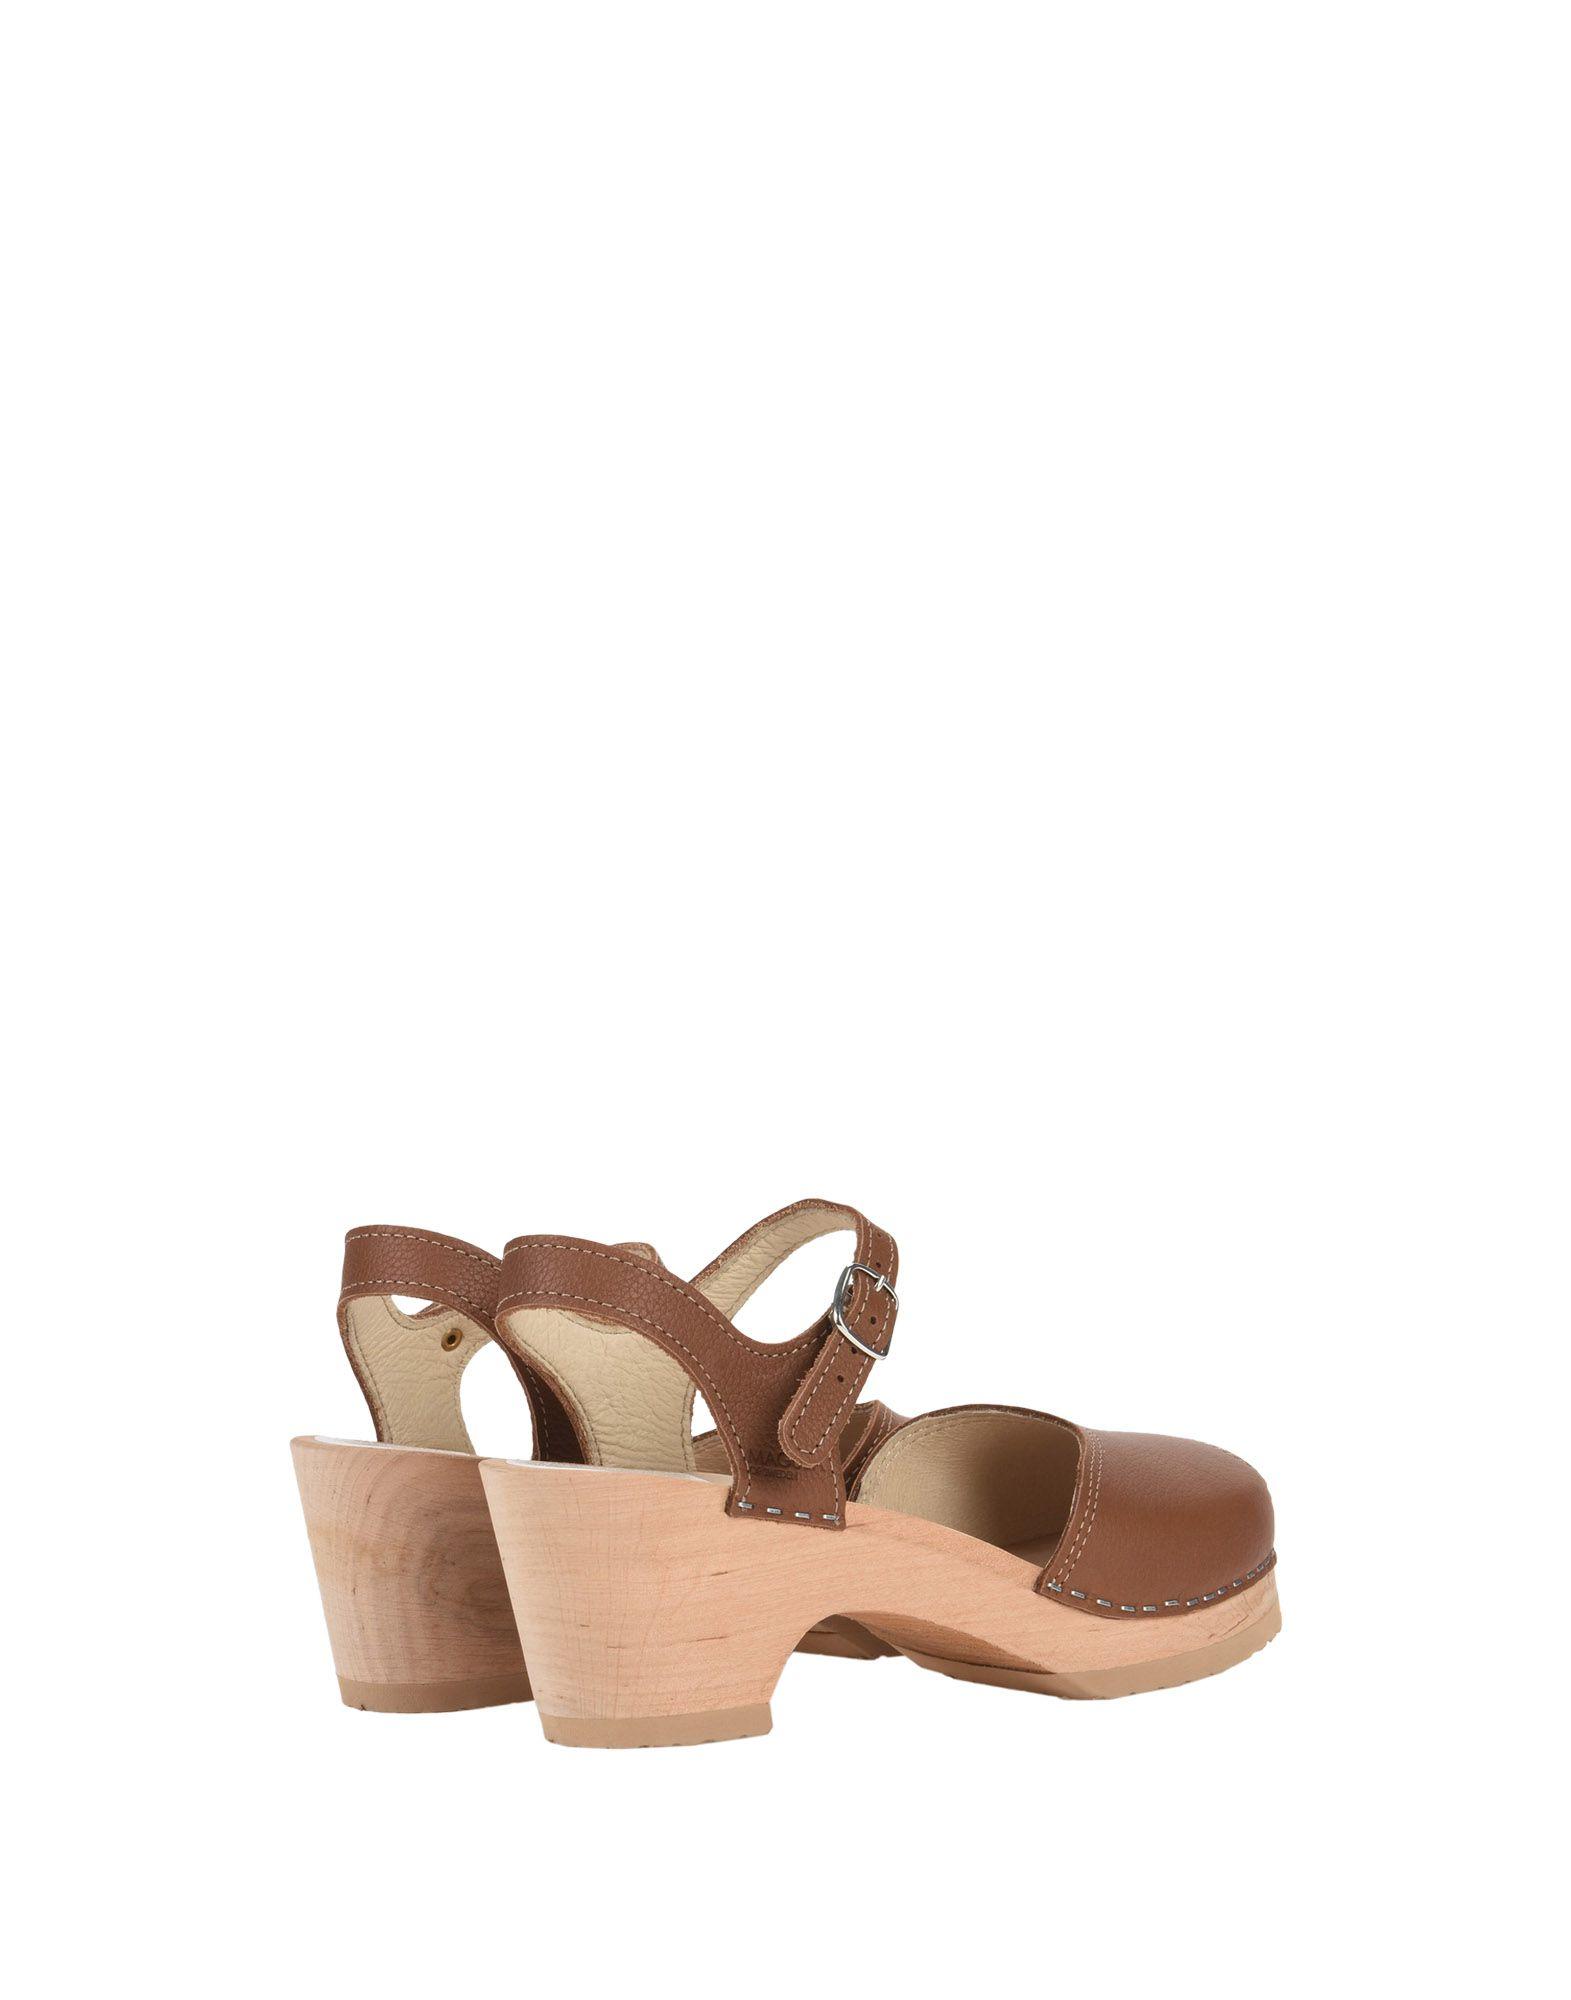 Haltbare Mode billige Schuhe Schuhe Maguba Bologna_Low  11469517UM Neue Schuhe Schuhe c1ae52